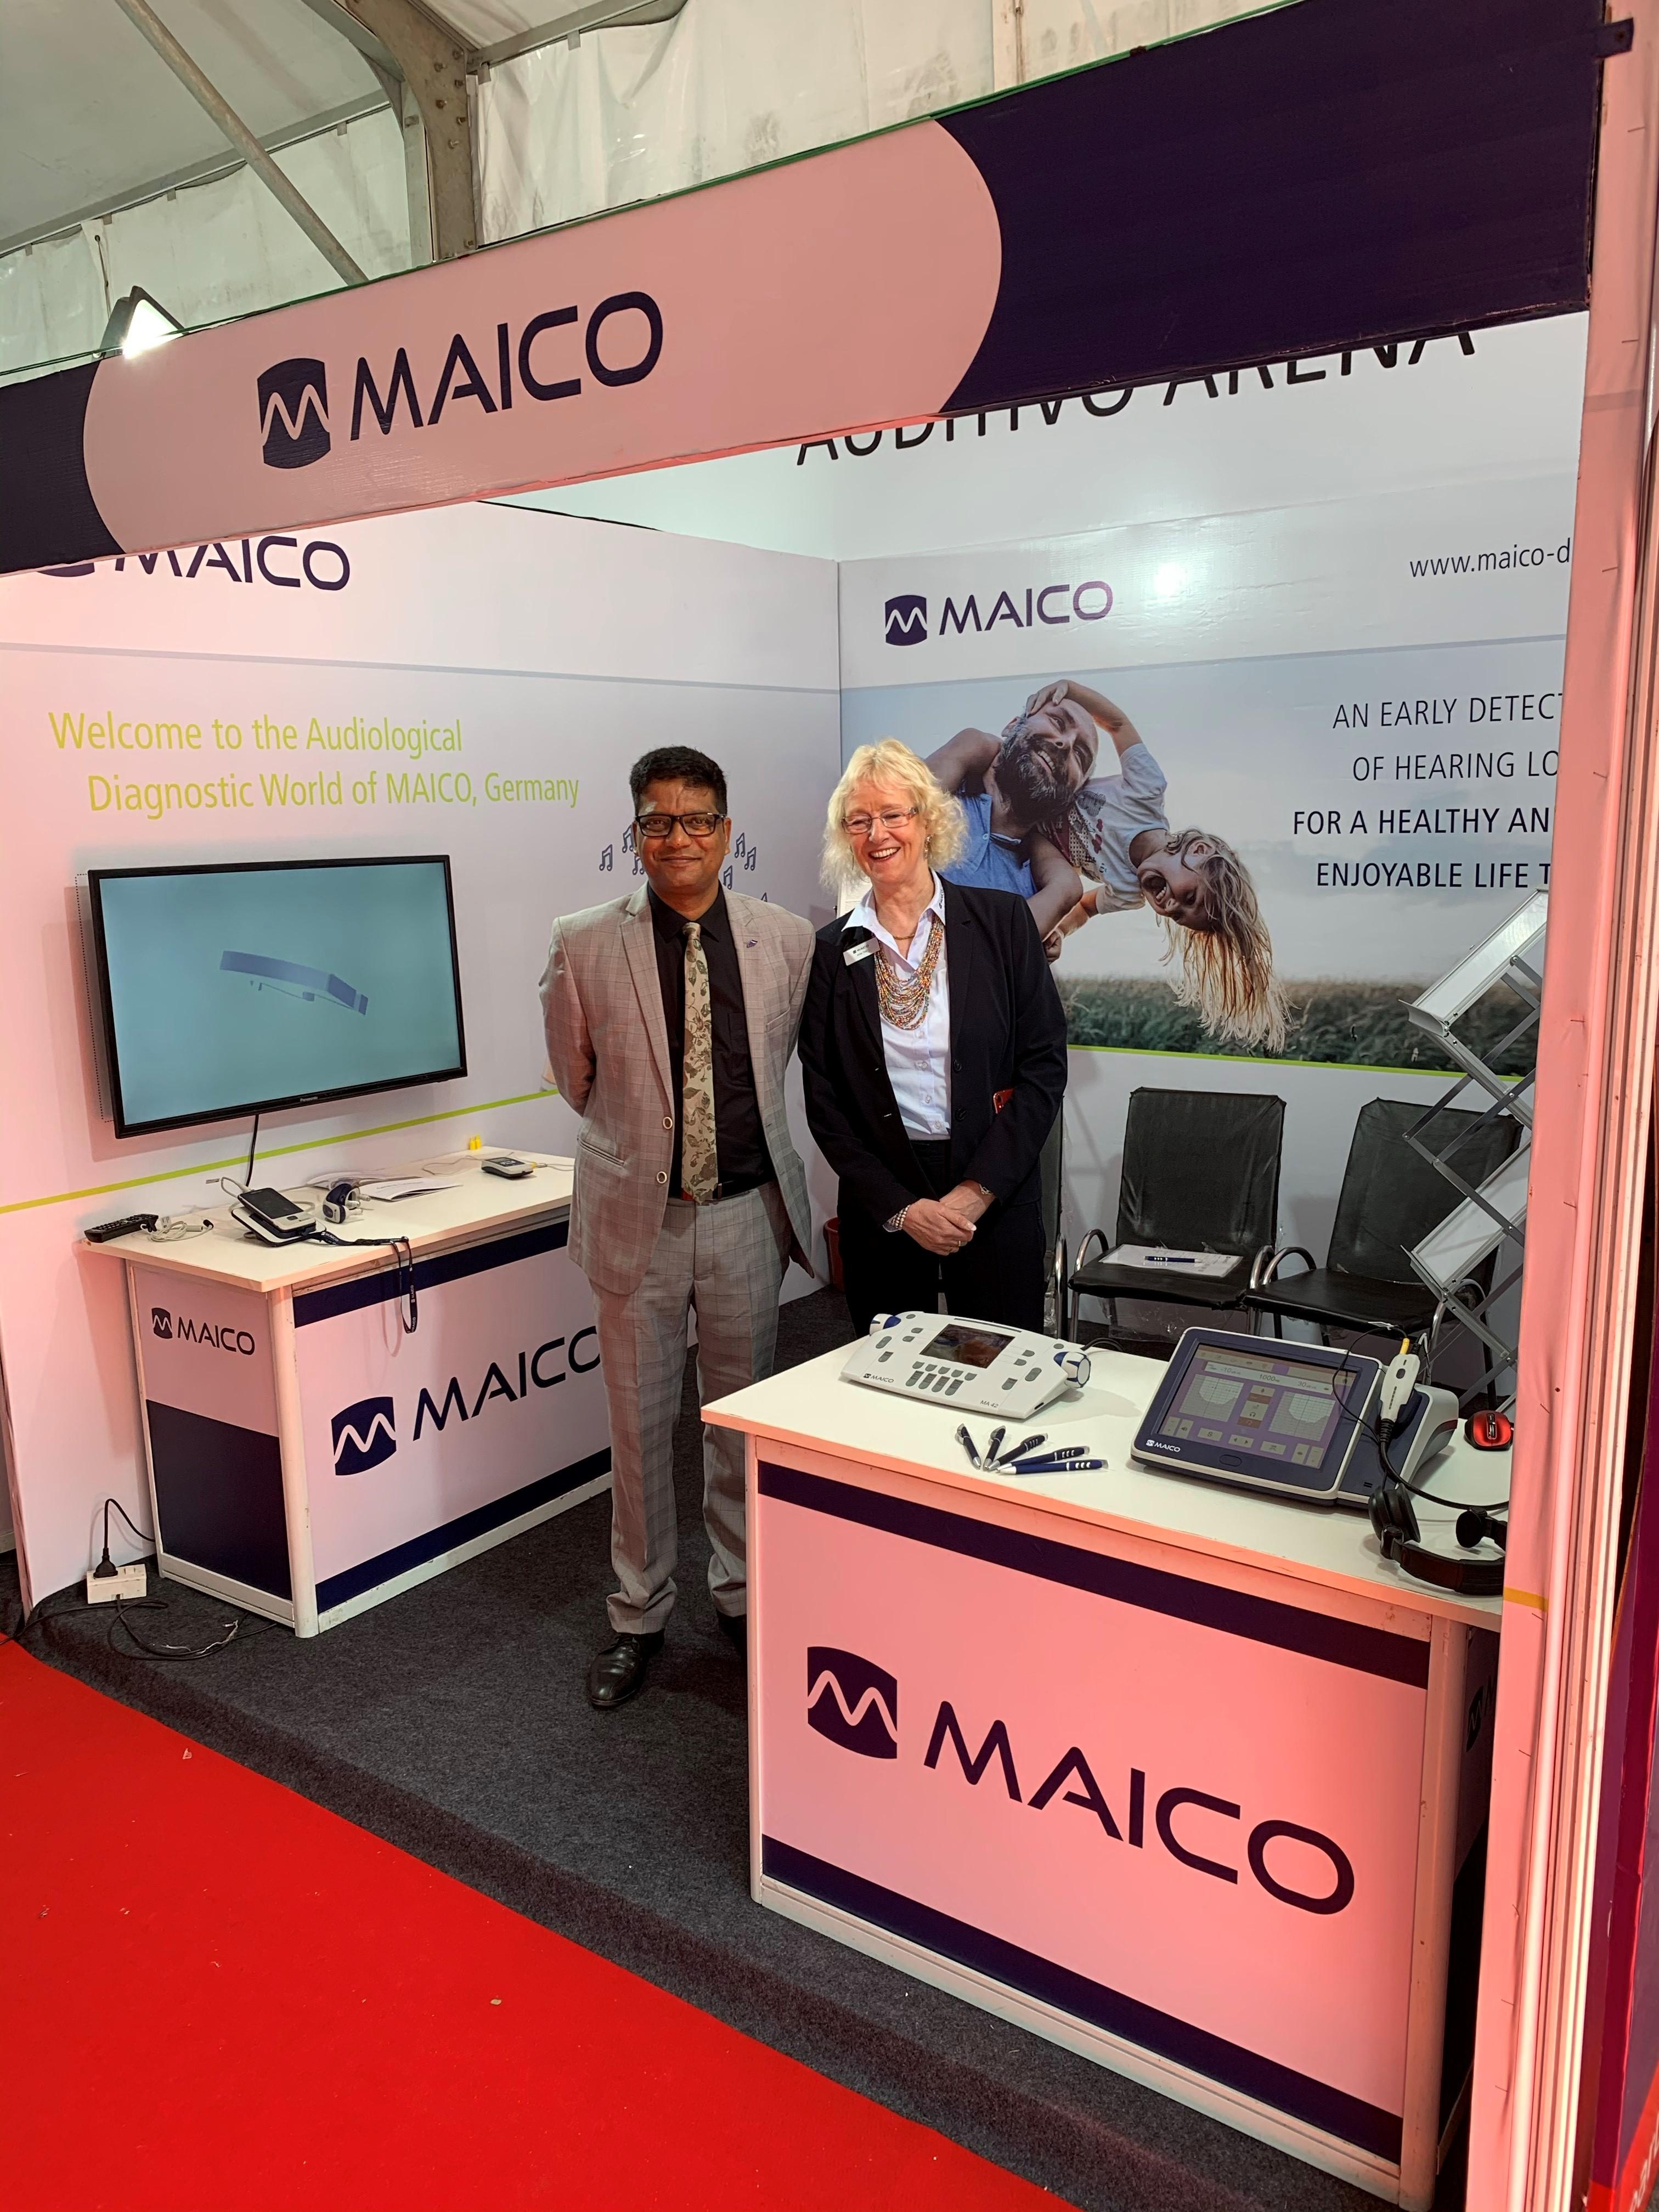 ISHACON 2020 MAICO and Auditivo present MAICO audiometers and tympanometers